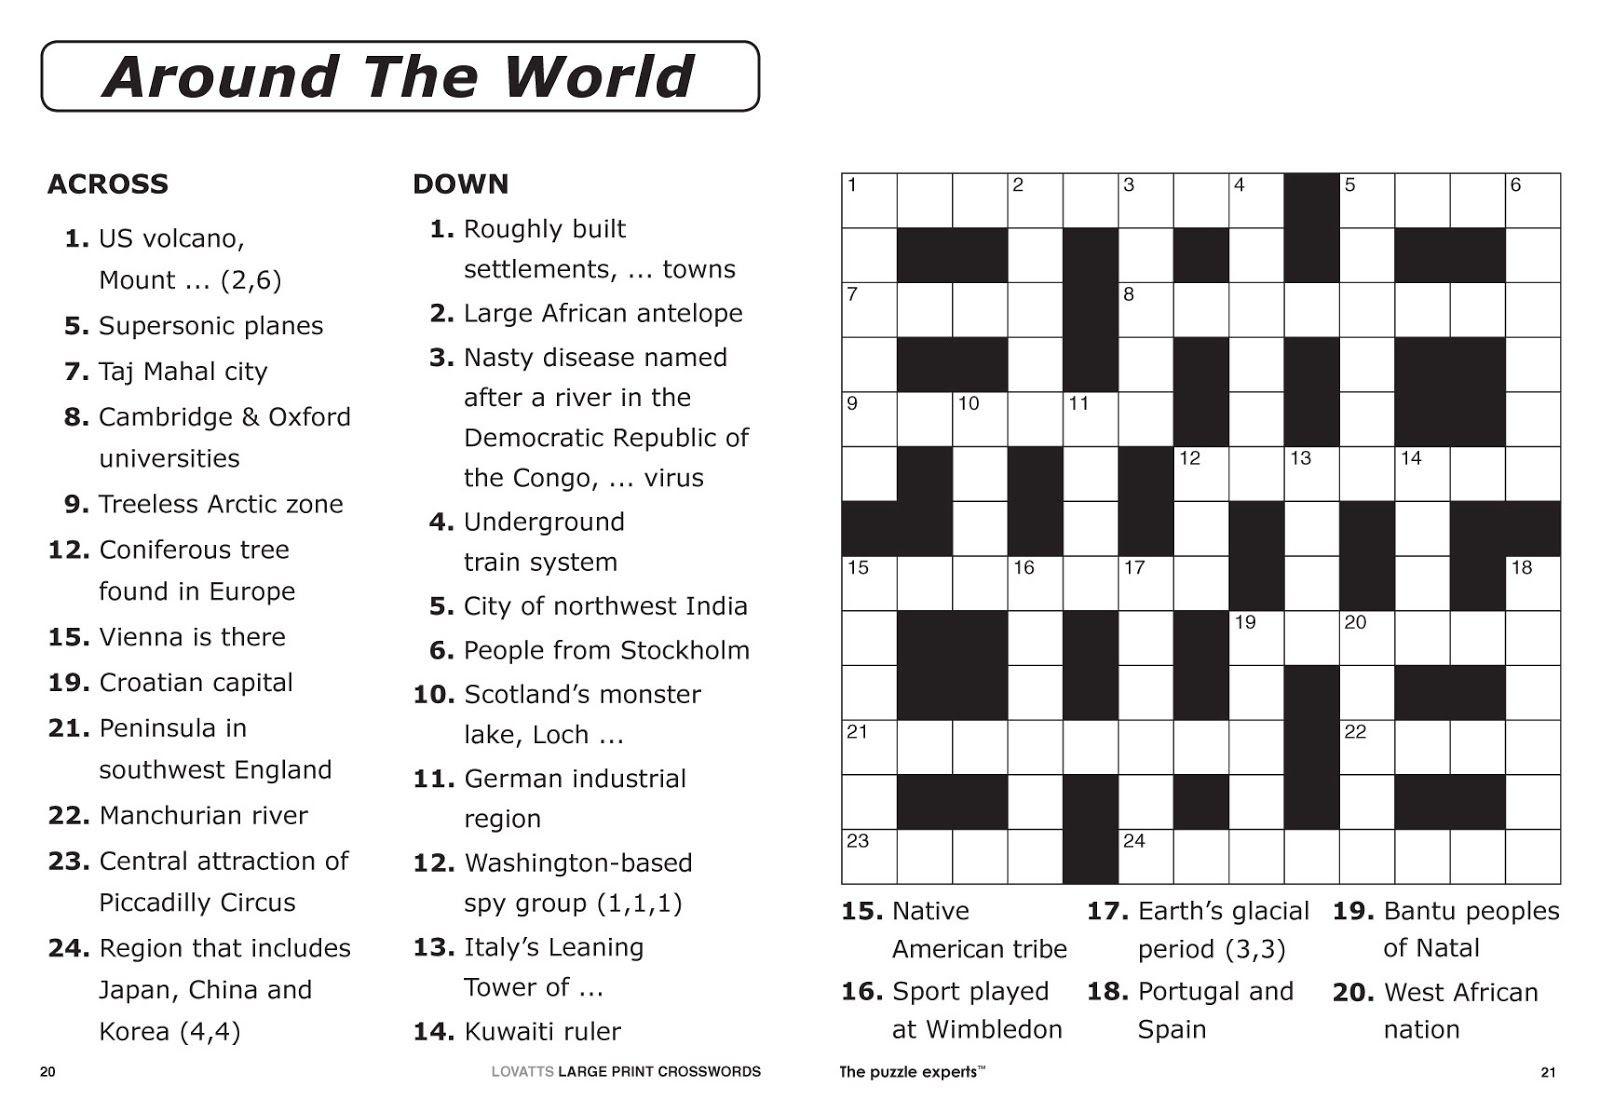 Free Printable Large Print Crossword Puzzles | M3U8 - Free Online Printable Crossword Puzzles